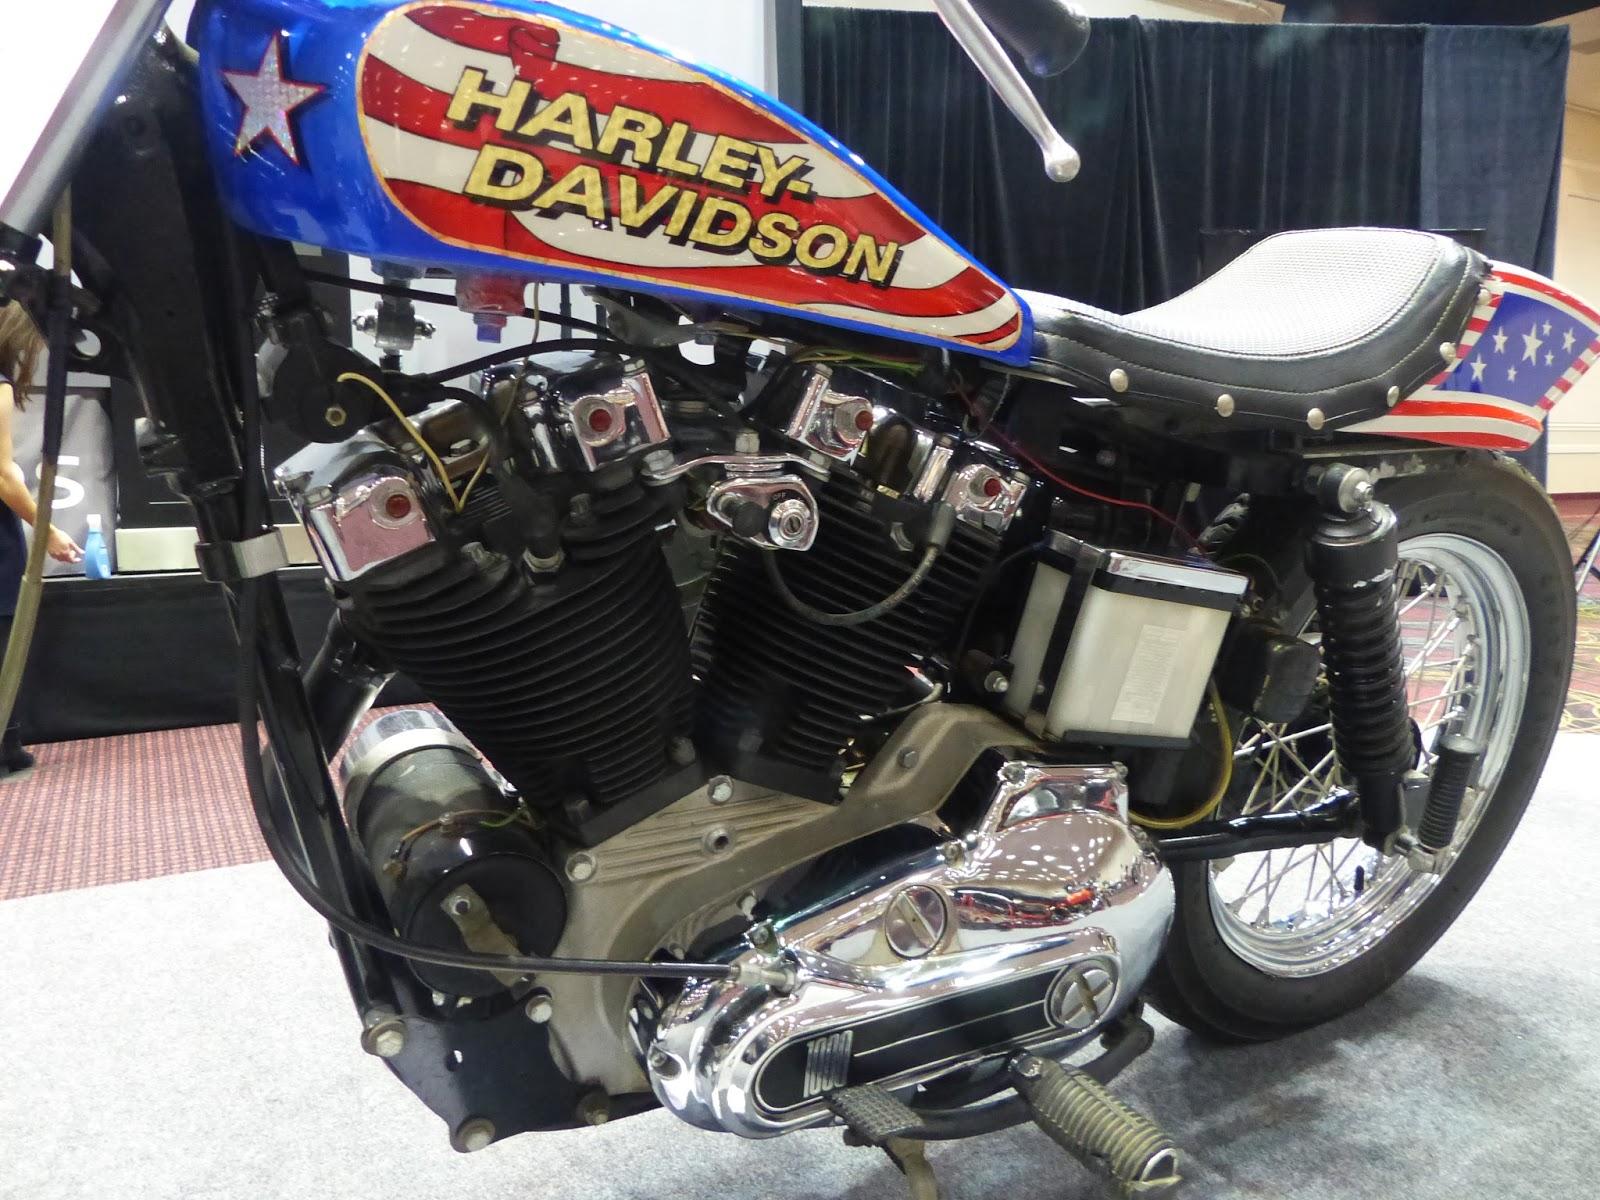 Harley Davidson Movie: OldMotoDude: 1976 Harley-Davidson XL-1000 Viva Knievel